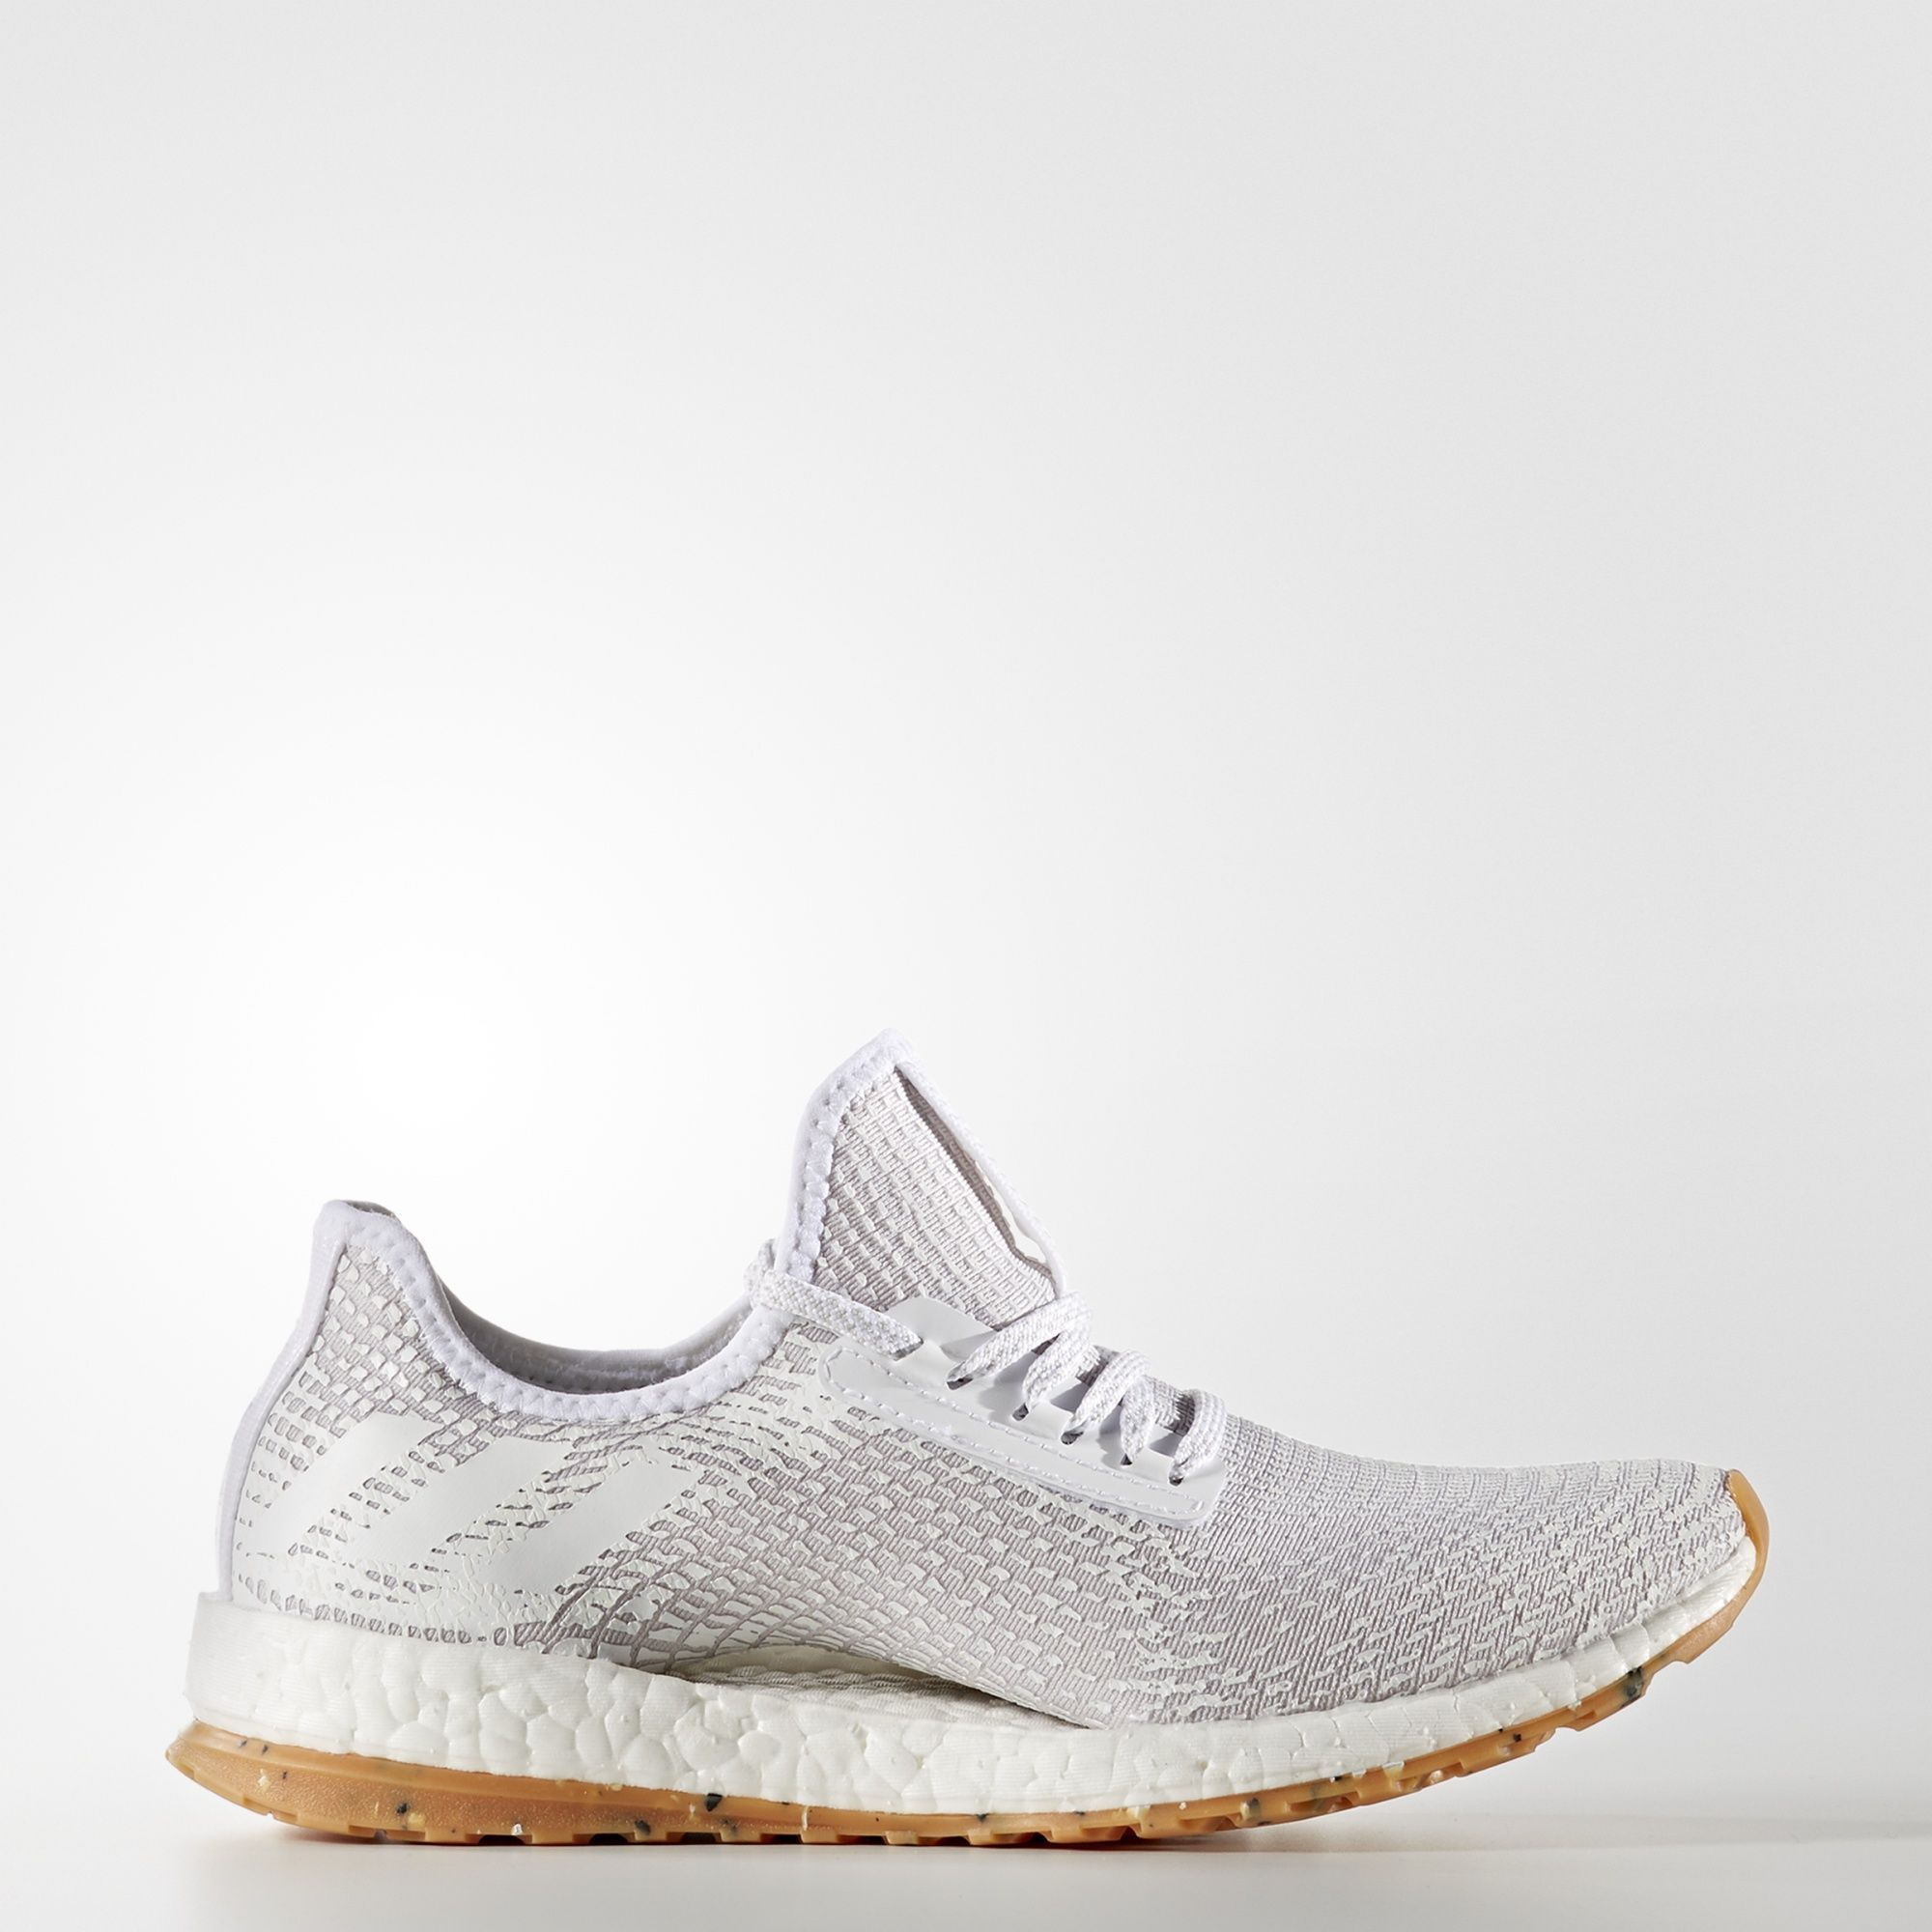 Adidas Pureboost X Atr Shoes Running Shoes Design Adidas White Shoes Adidas Shoes Women